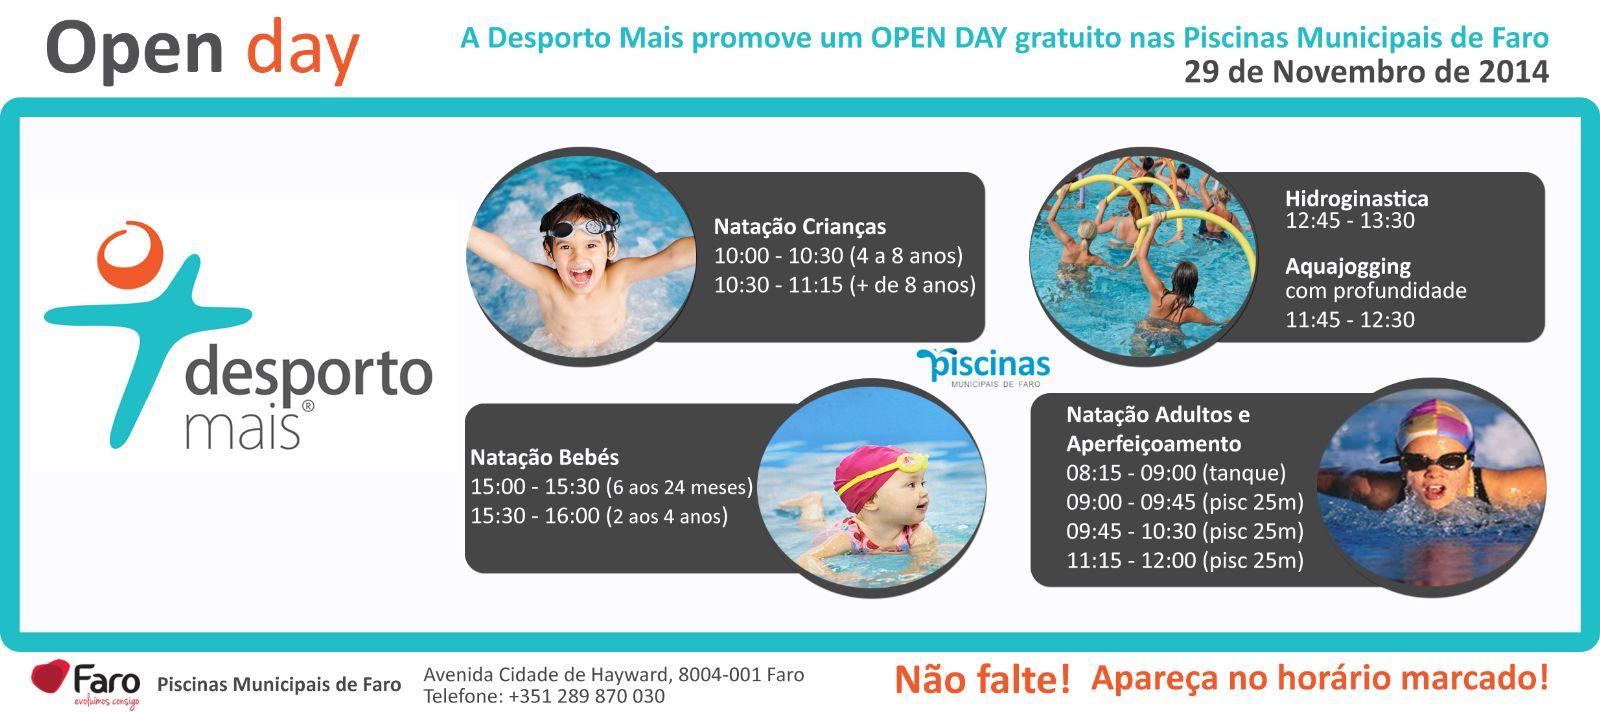 Open day - Faro